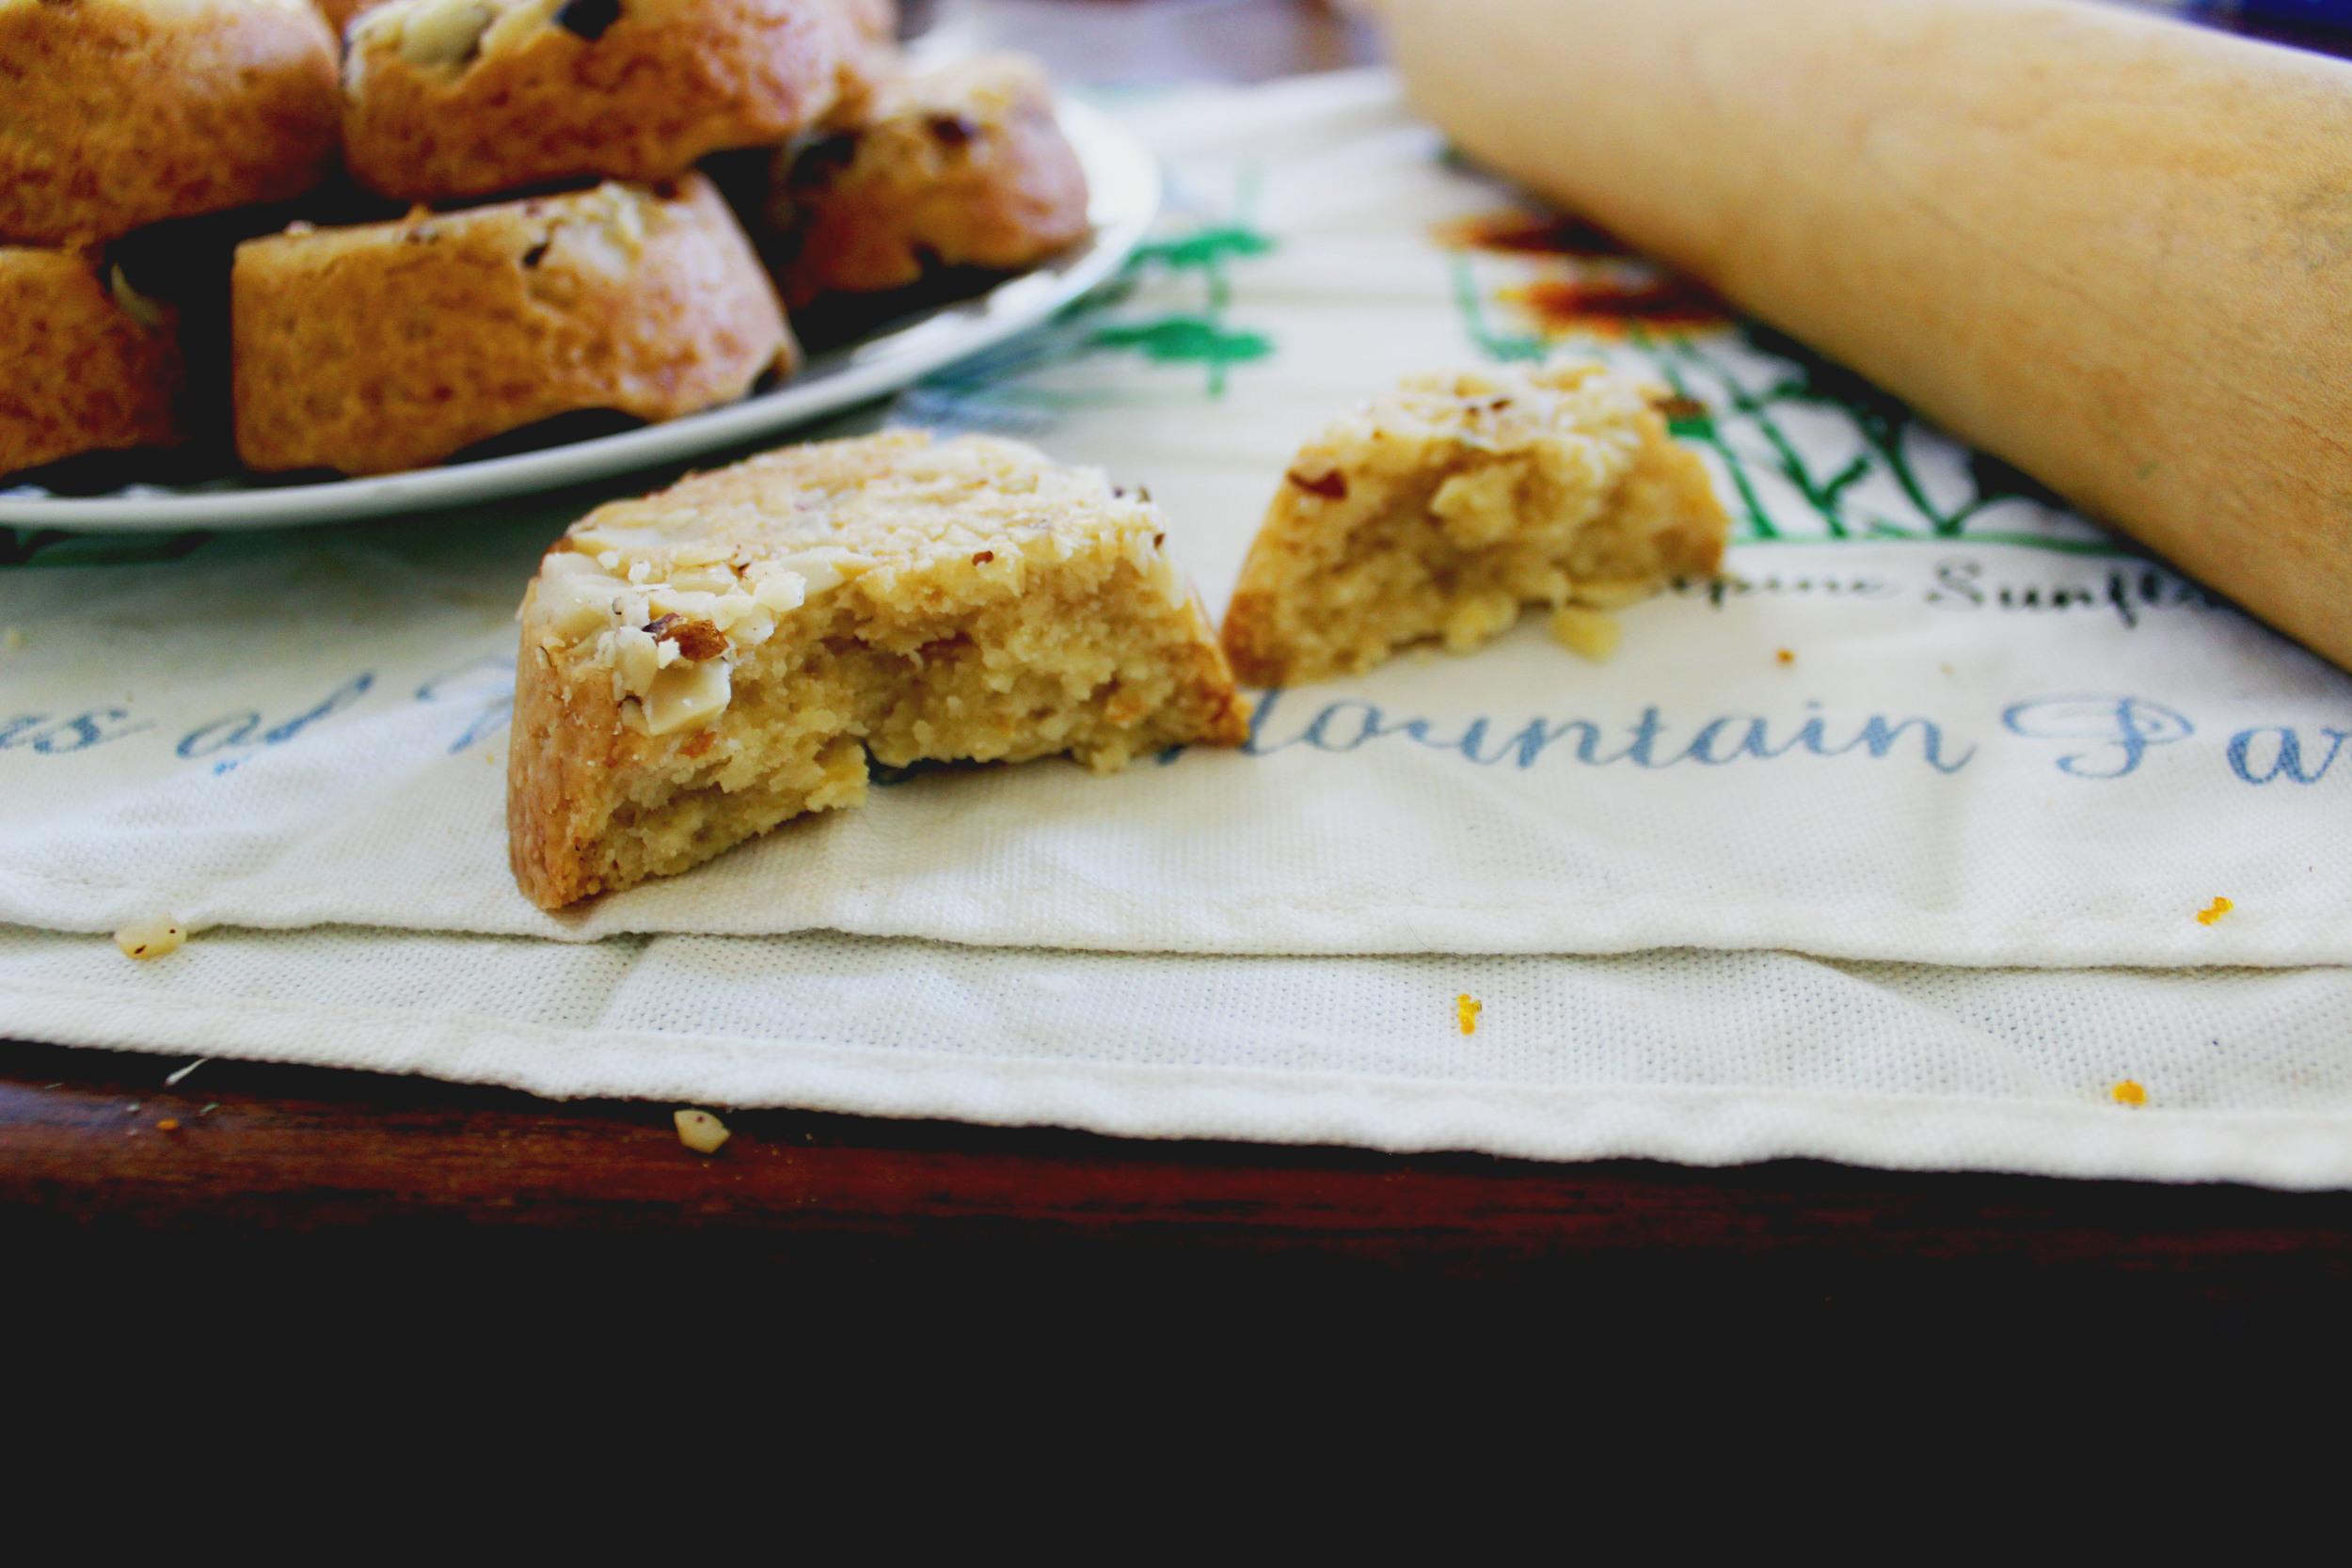 Orange and Brazil Nut Scotch (Scottish) Shortbread Cookies